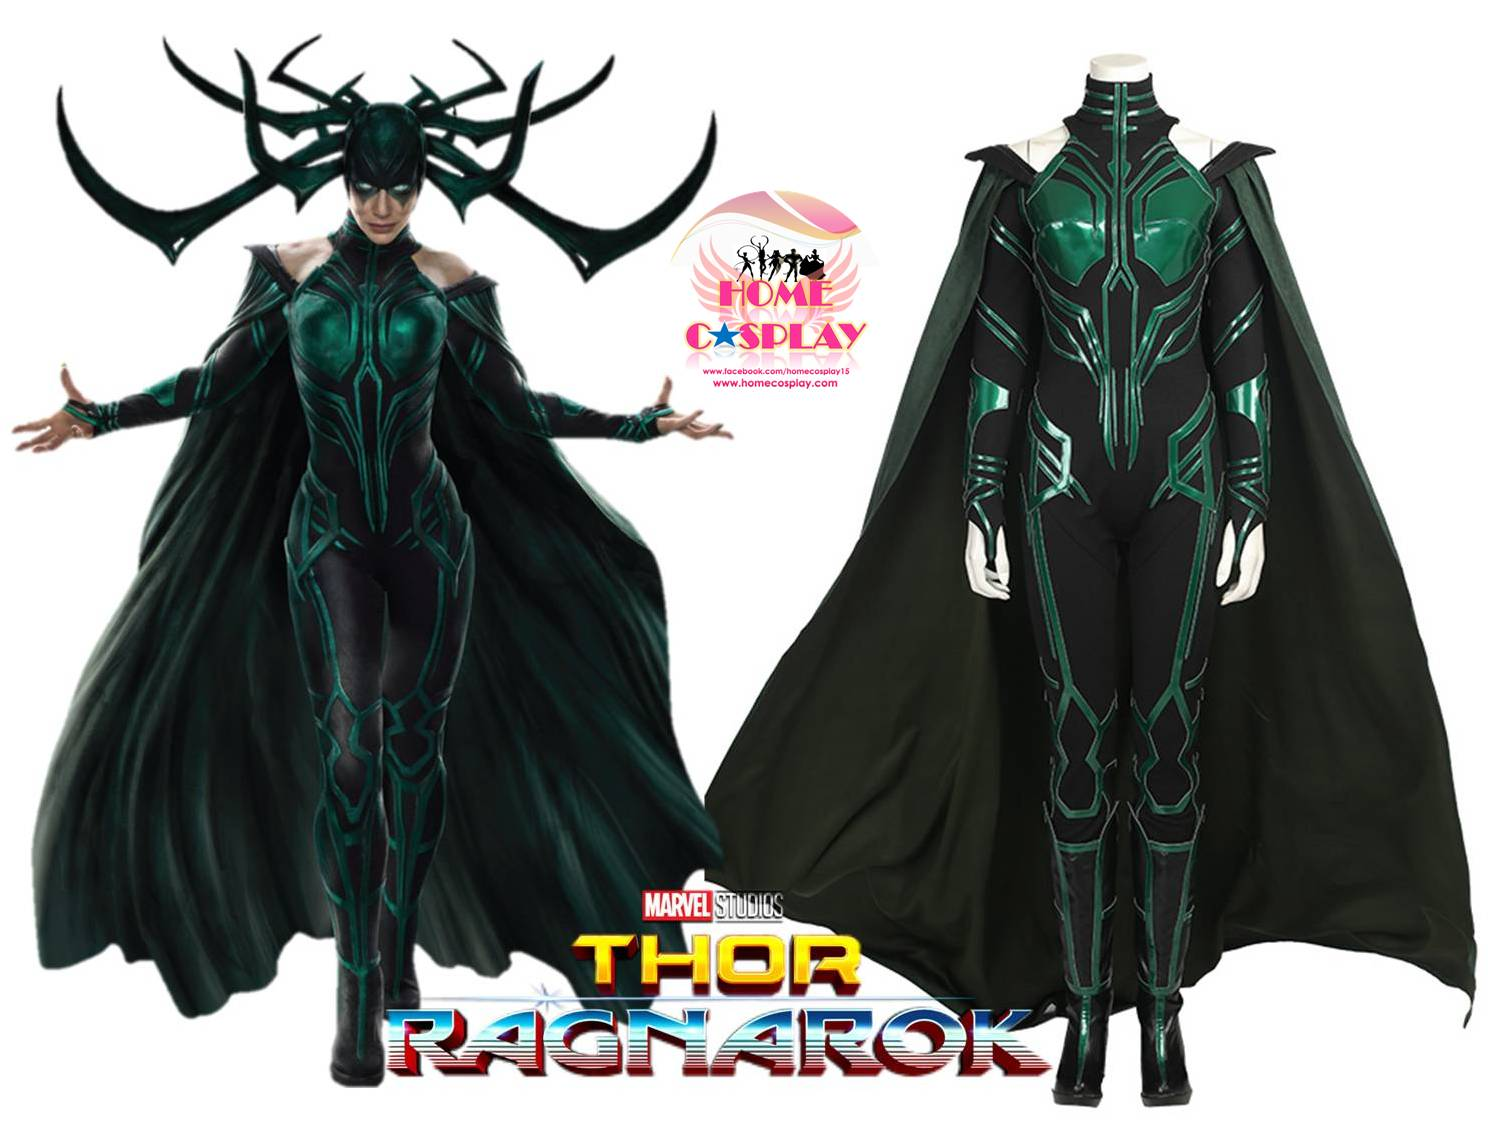 Super Premium Set: ชุดพรีเมียม เฮลา Hela - Thor Ragnarok